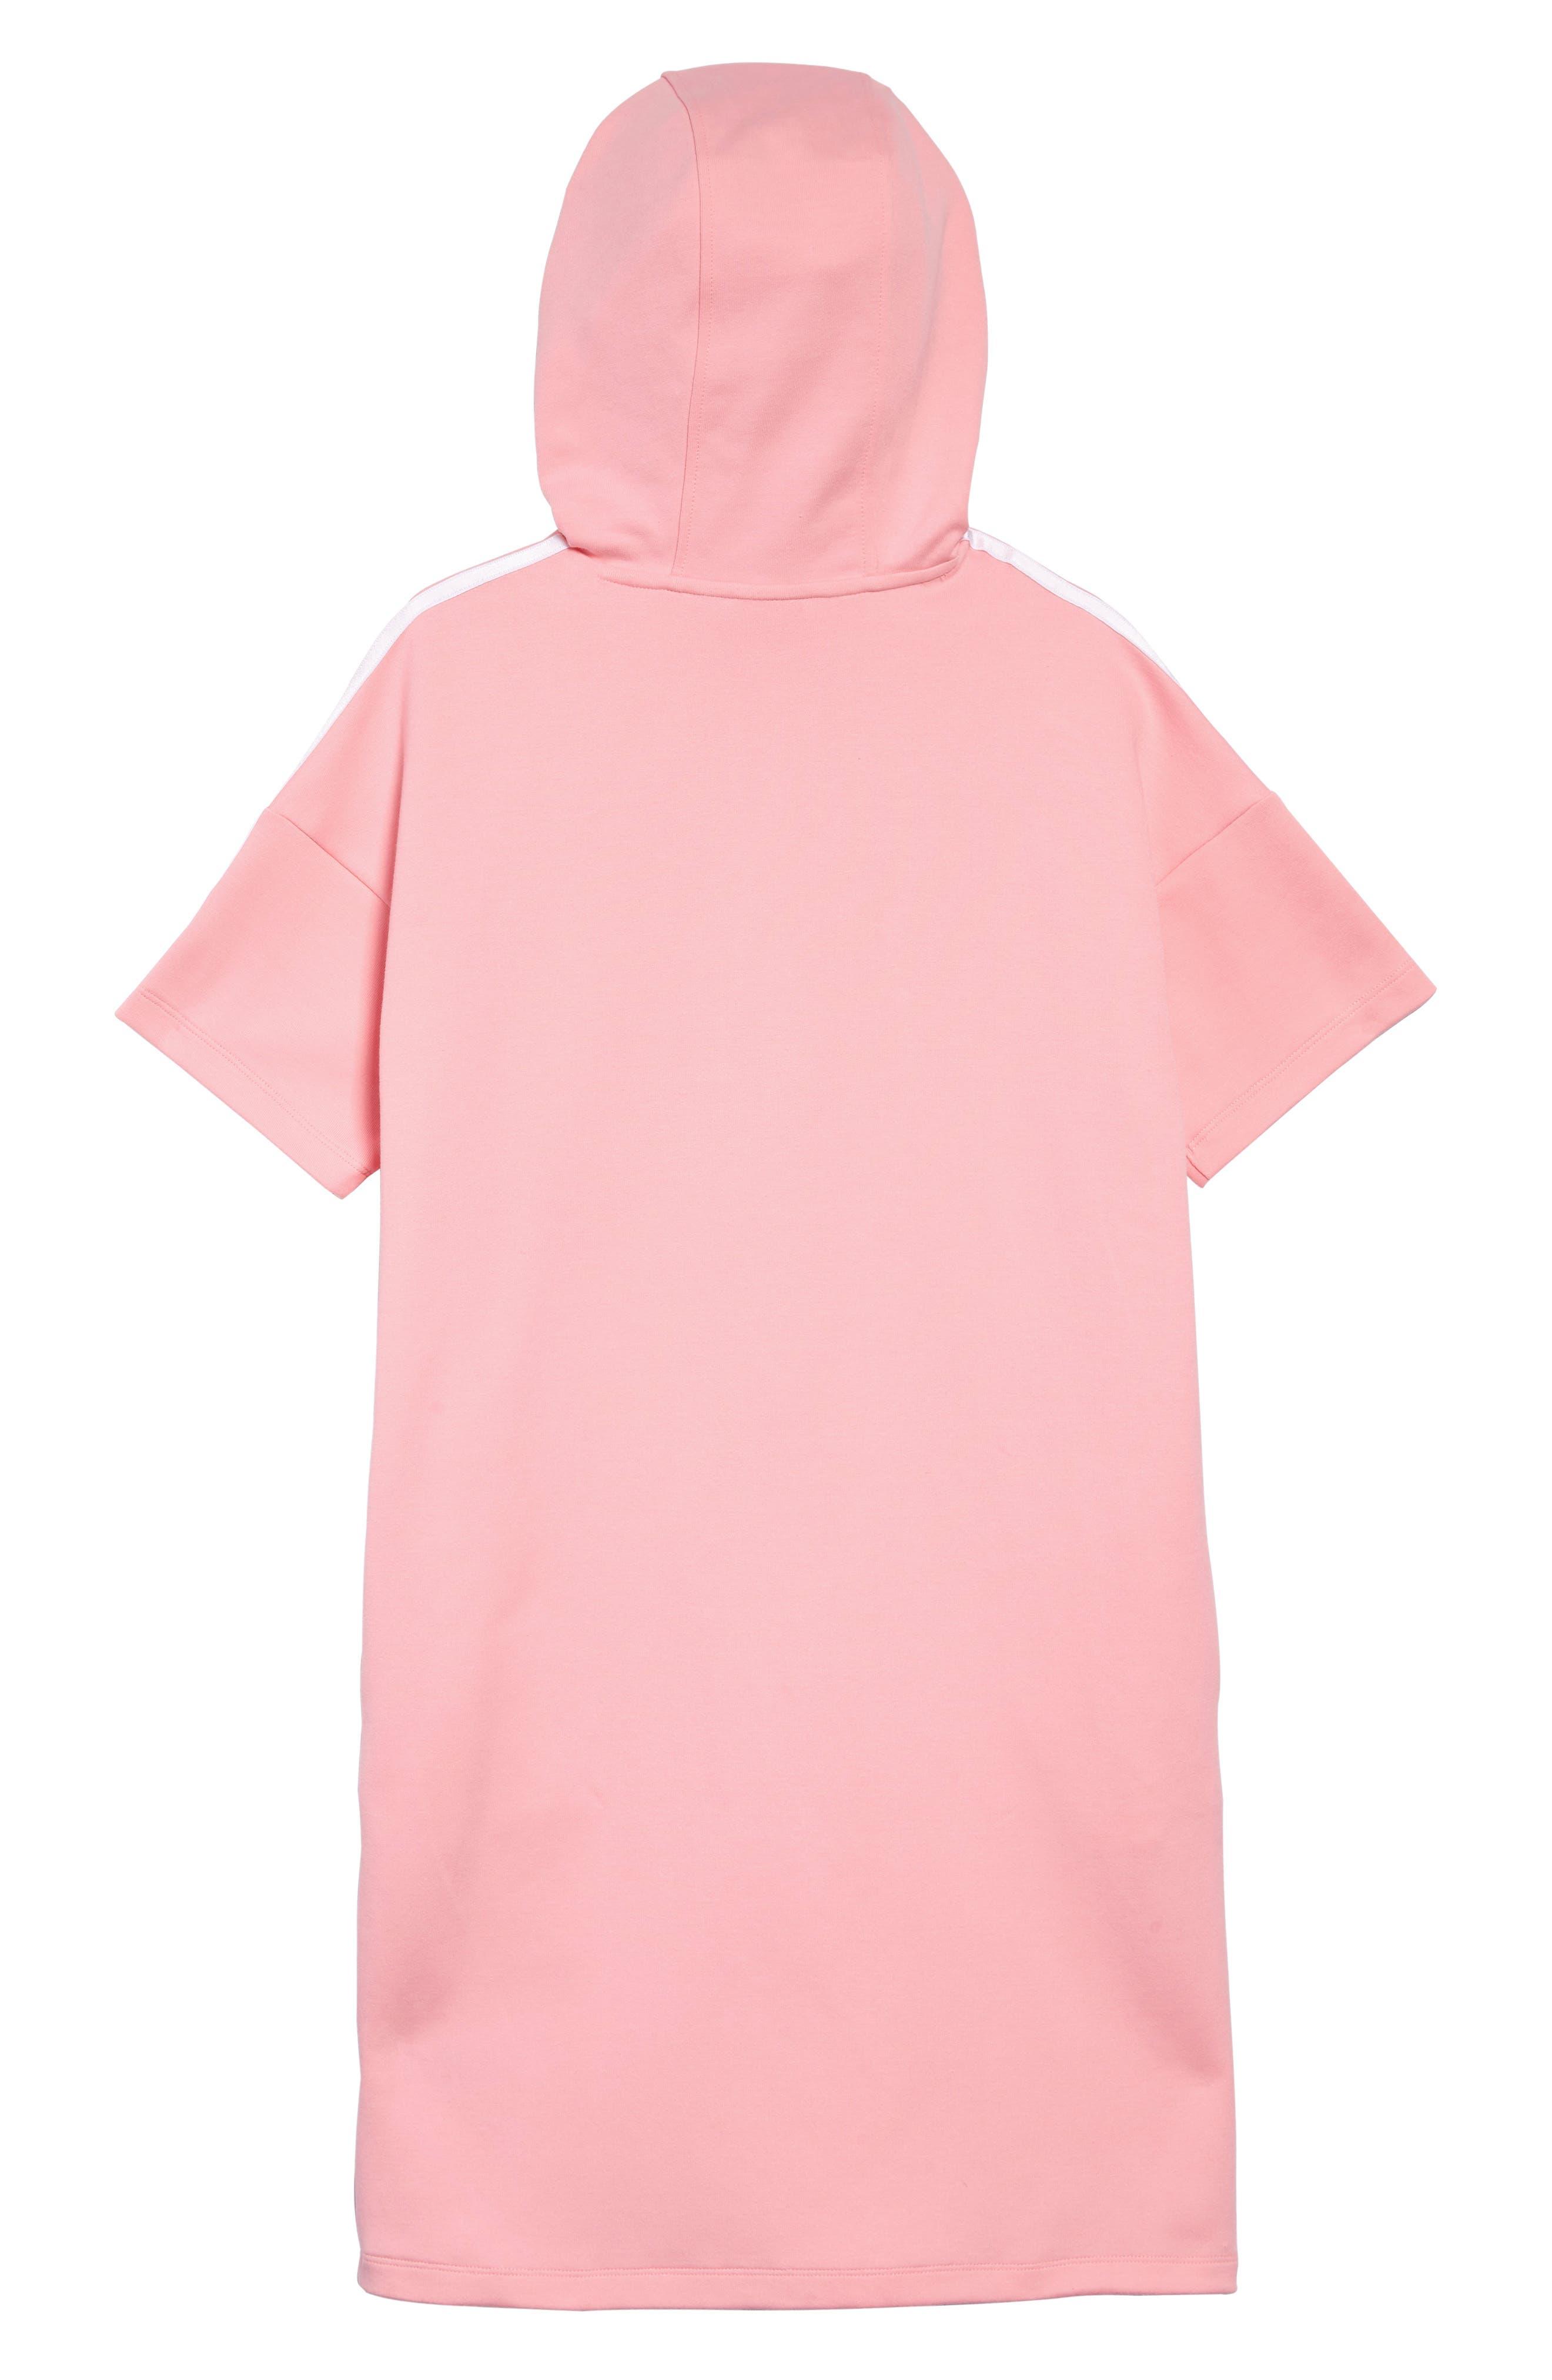 ADIDAS ORIGINALS, Logo Hooded Dress, Alternate thumbnail 2, color, LTPINK/ WHITE